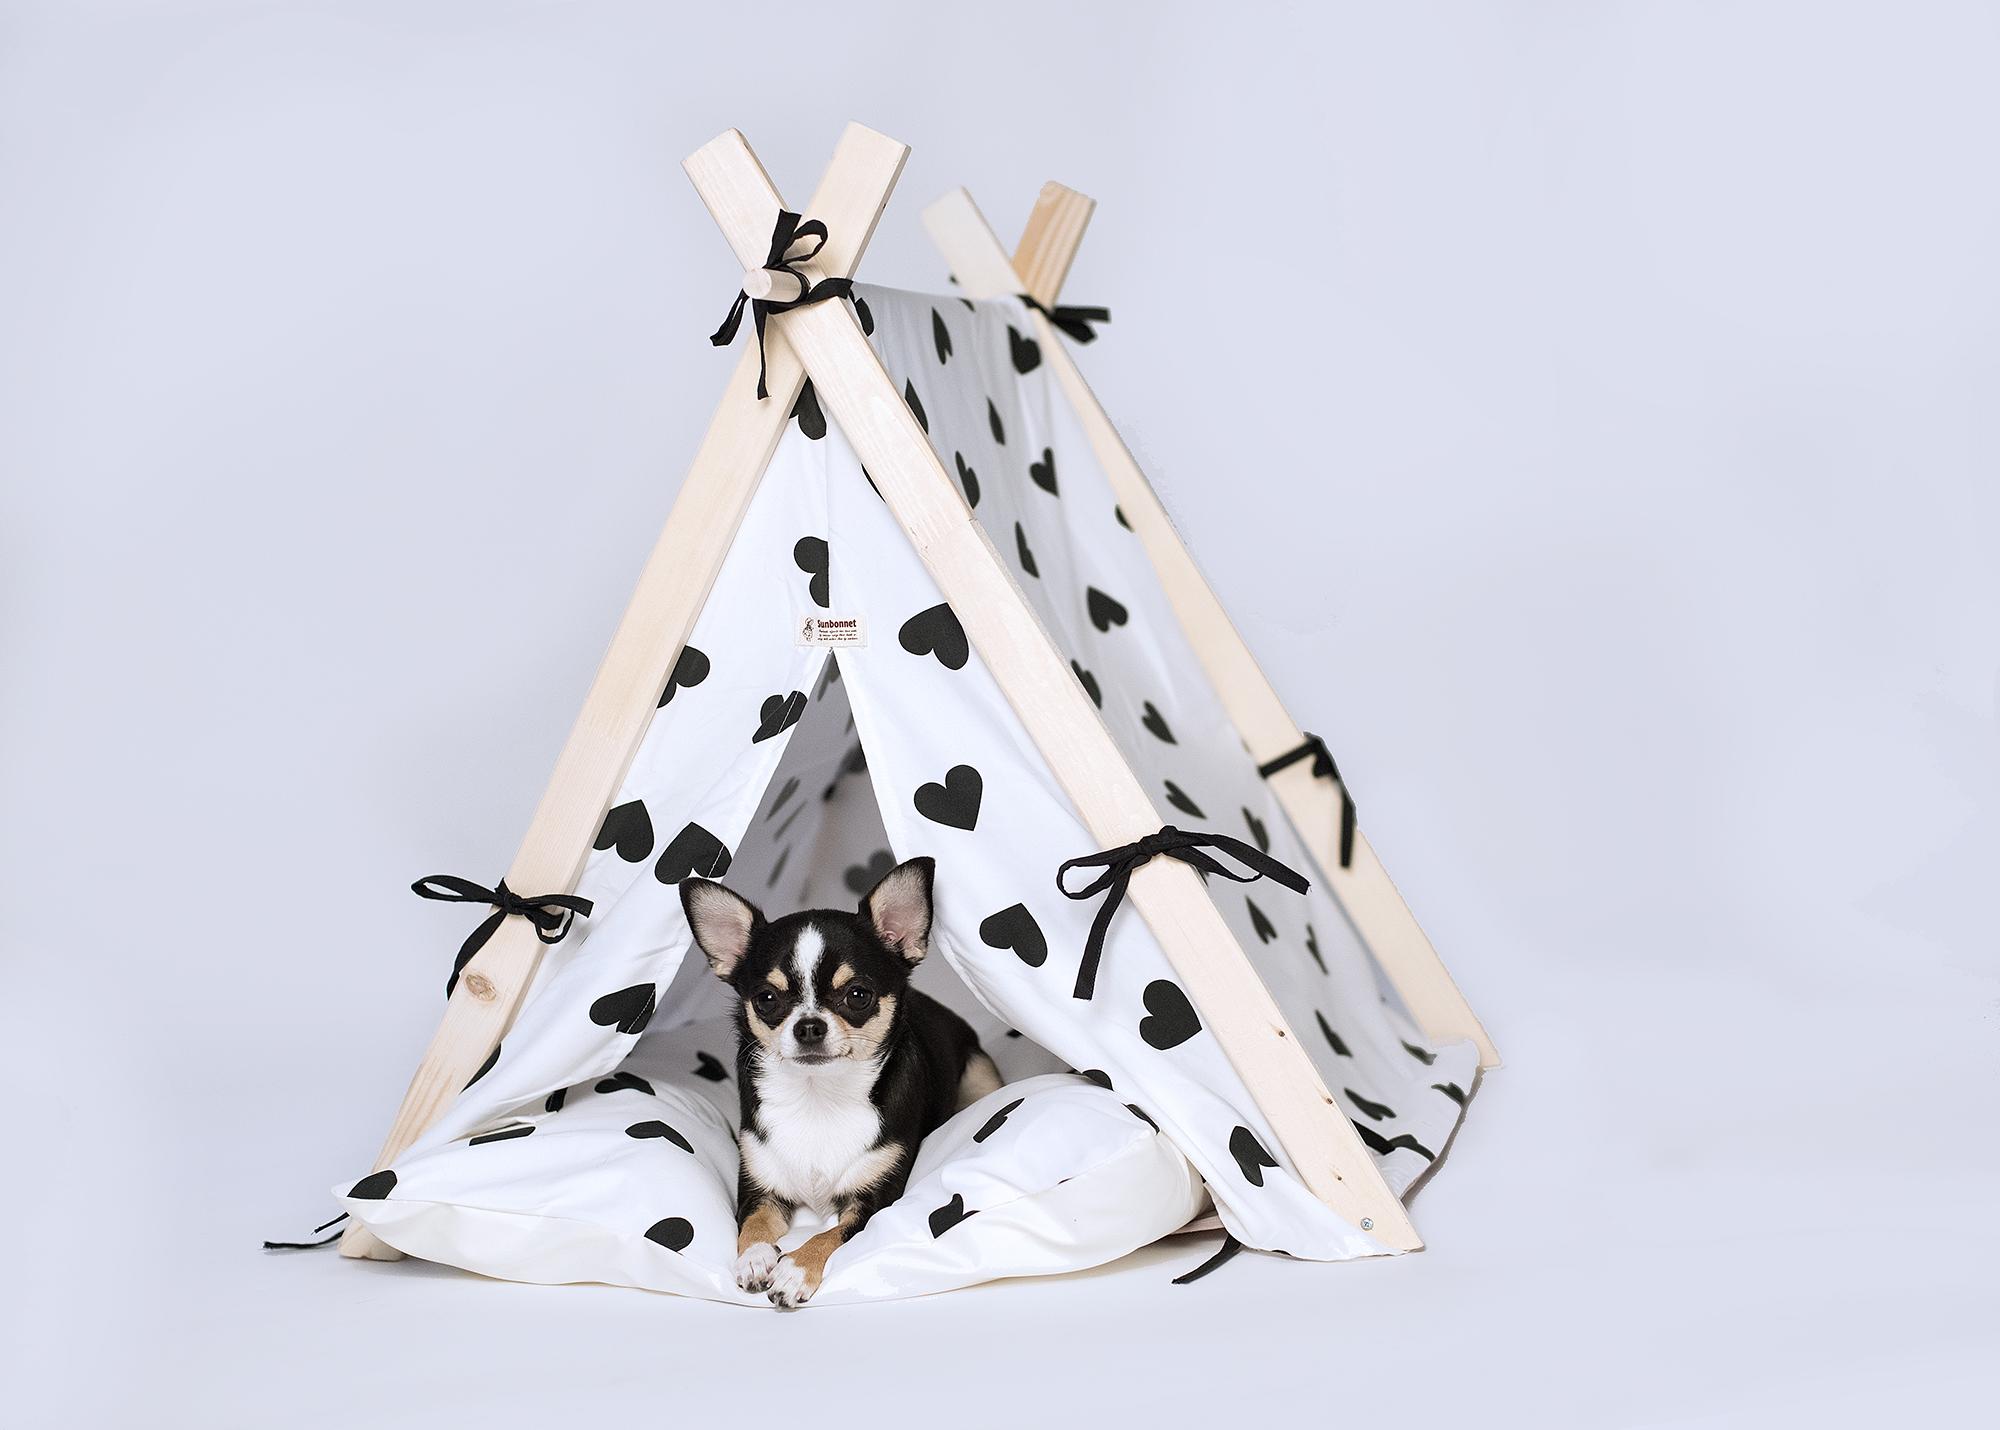 triangulartent-01-02.jpg